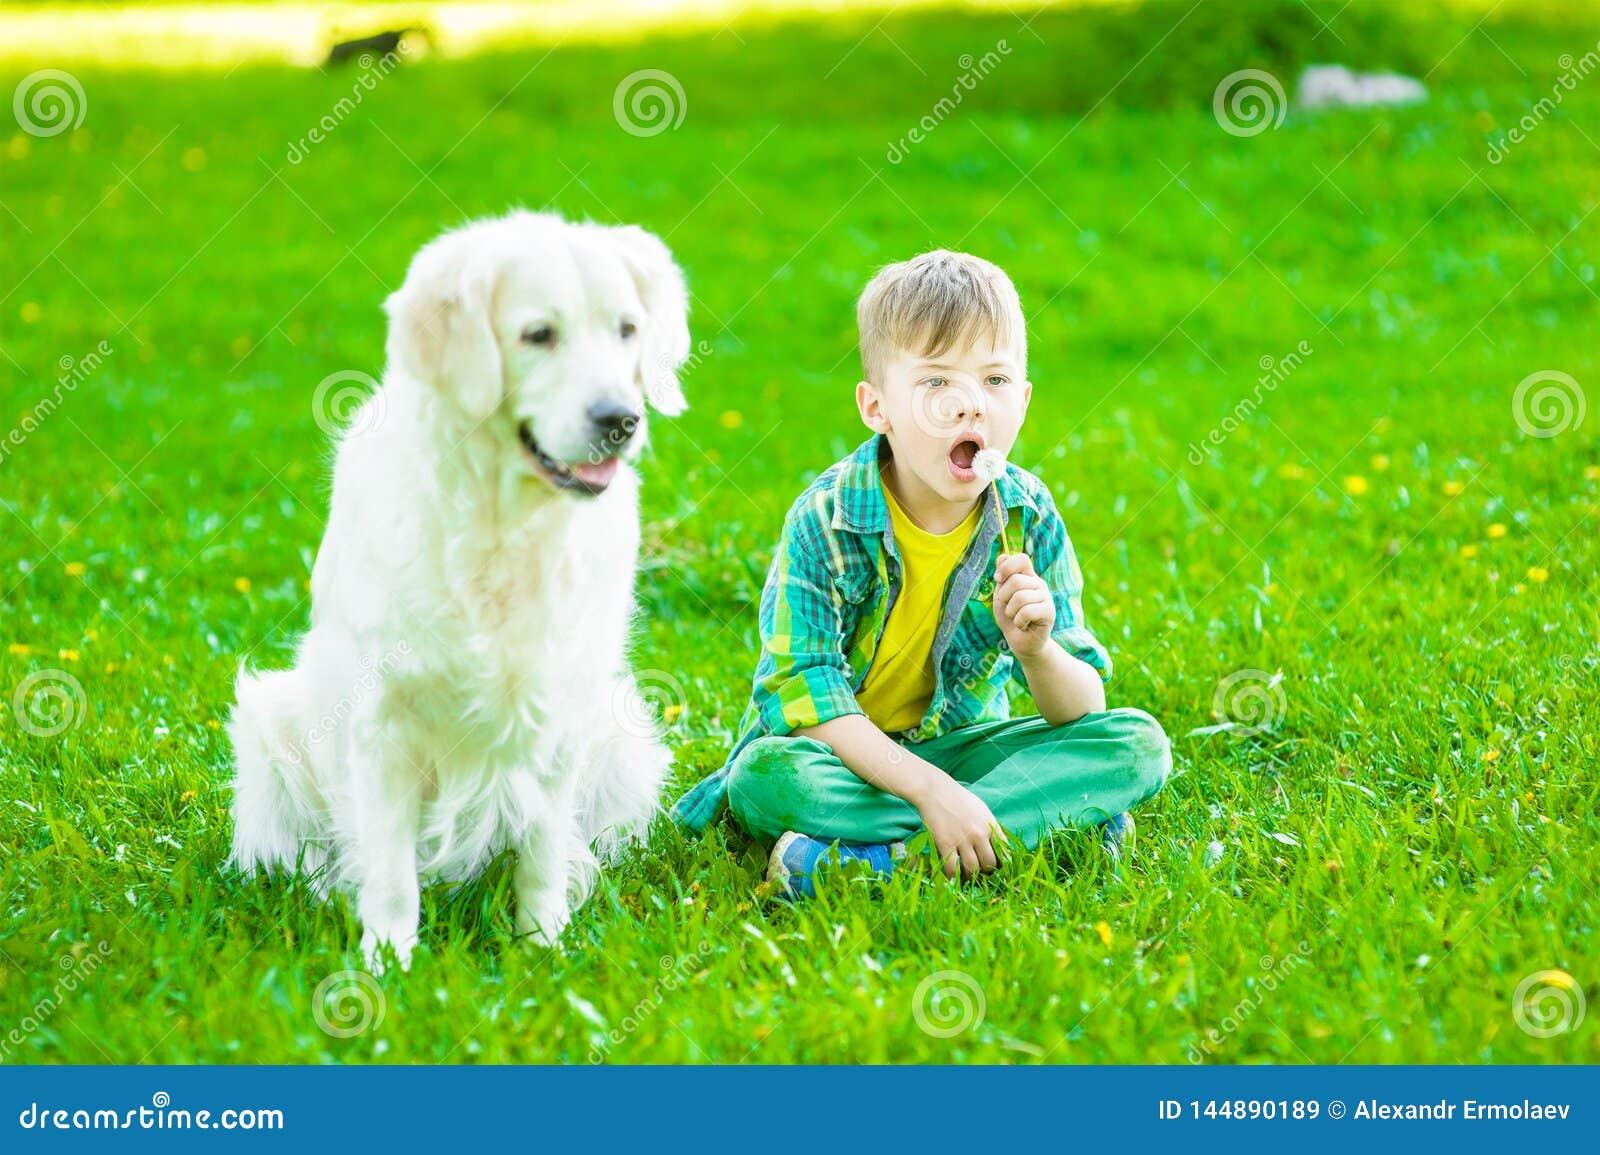 Boy with golden retriever dog blowing dandelion